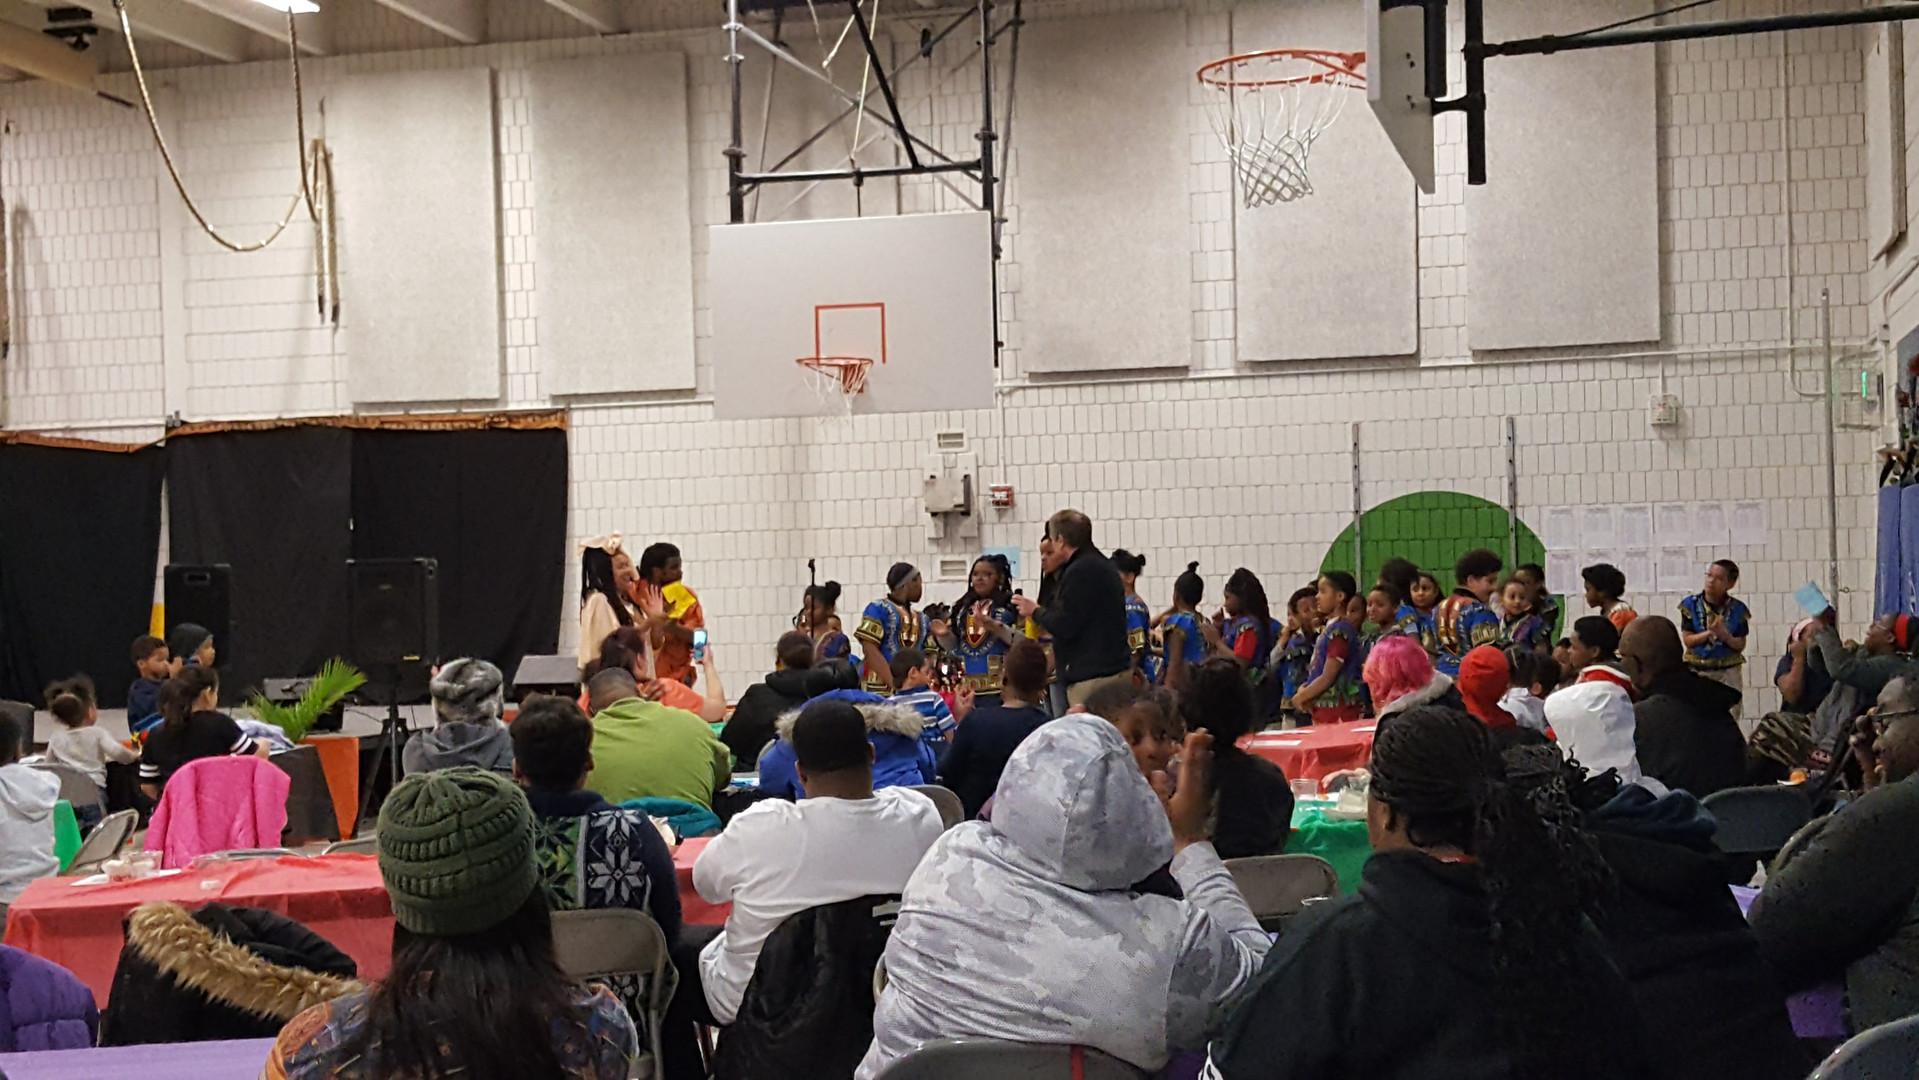 SRTS_Maxfield Elementary Culture Night_5